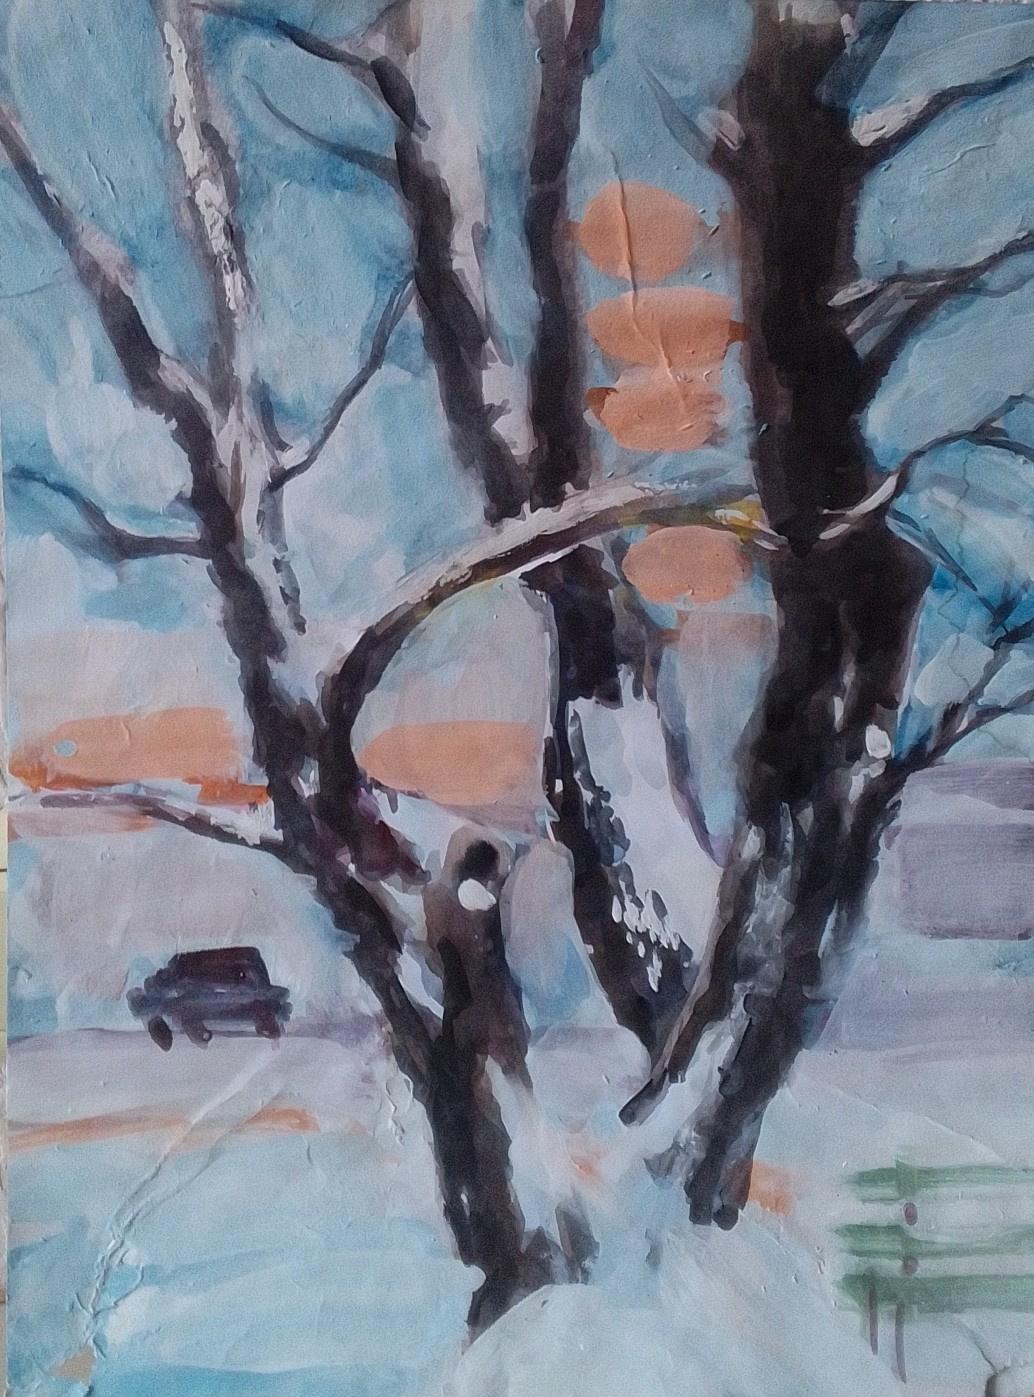 Edward Rudolfovich Votyakov. Предновогоднее настроение. Дерево у дома 16 по улице Вильямса.